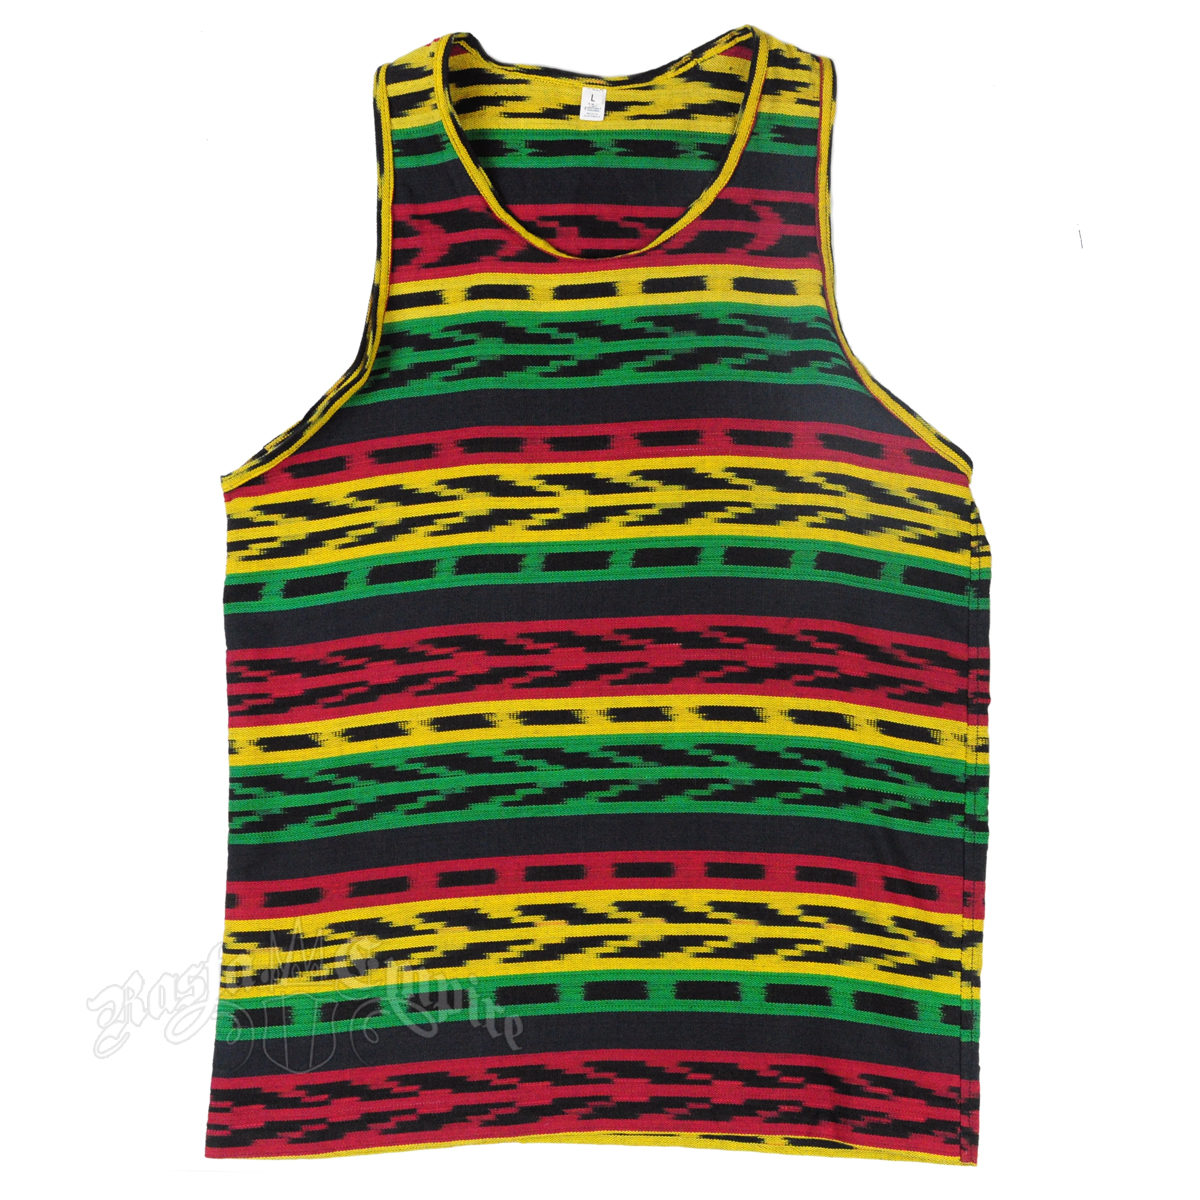 rasta u0026 reggae knitted tank top - menu0027s VDYACAC